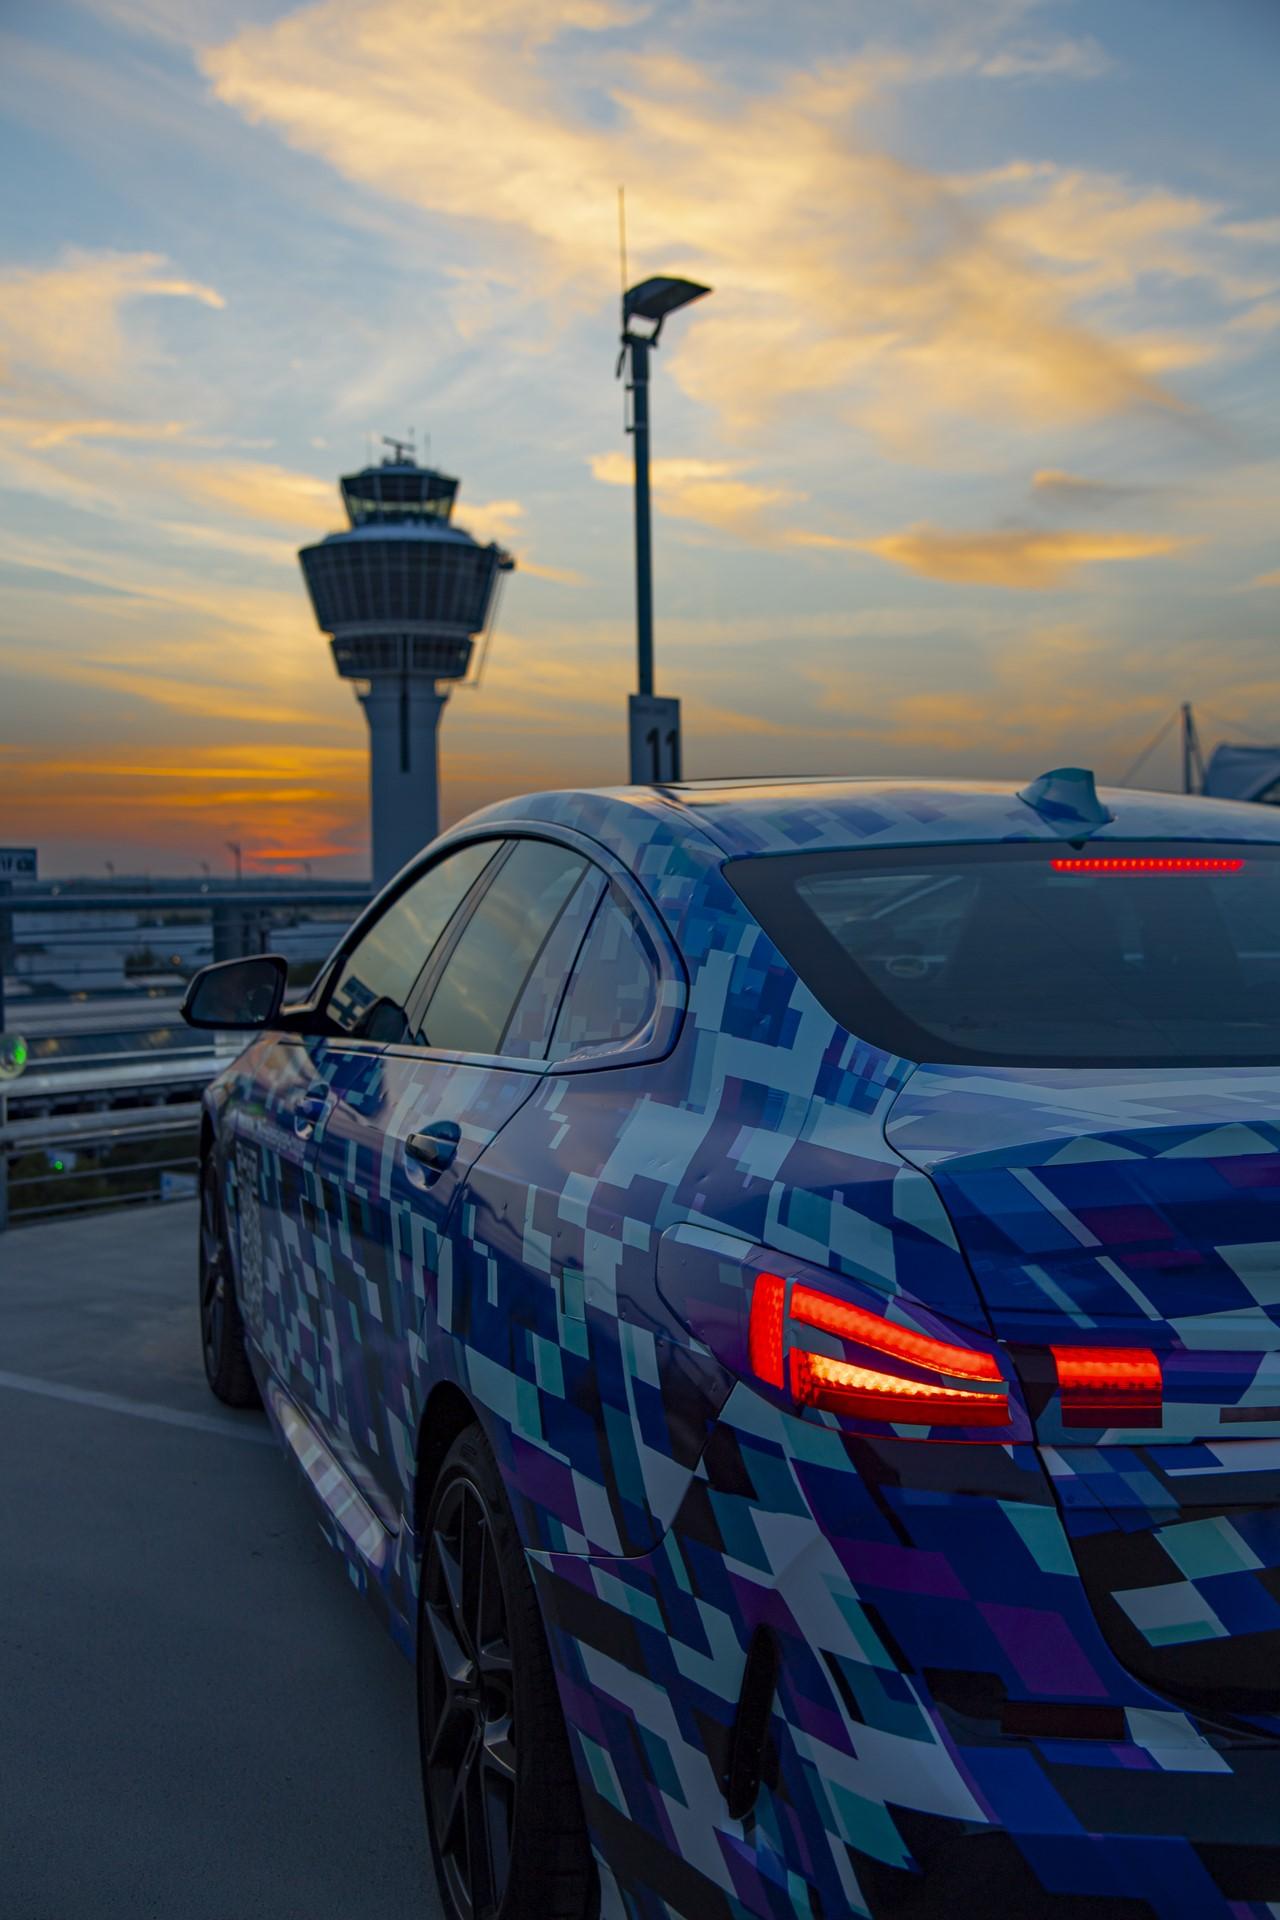 BMW-2-Series-Gran-Coupe-2020-spy-photos-37